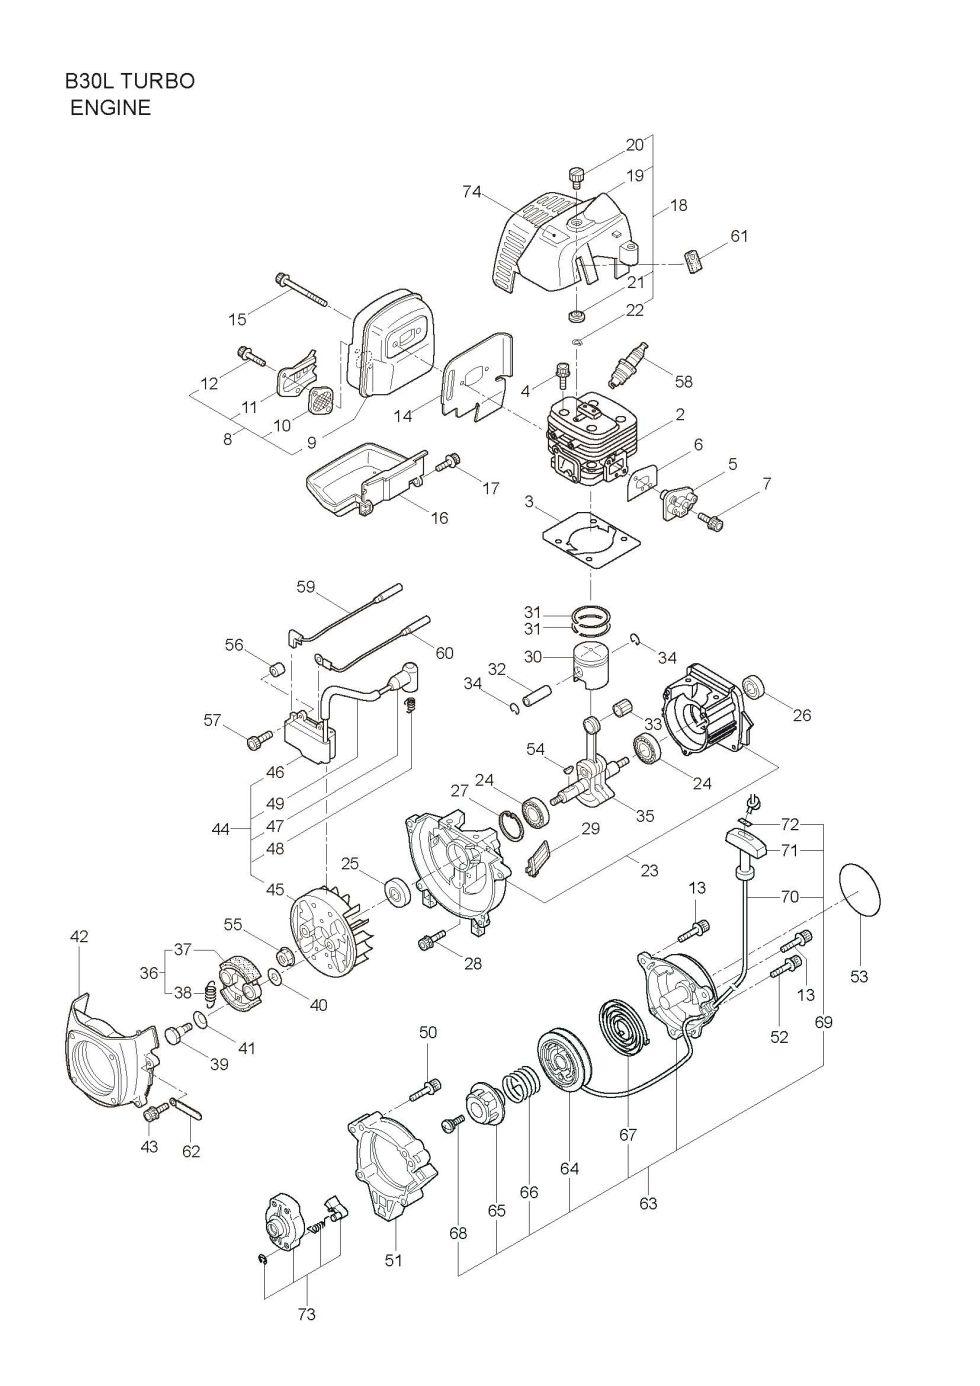 Maruyama Parts Lookup B30l Turbo Diagrams Accessories Katana Engine Diagram Carburetor Fuel Tank